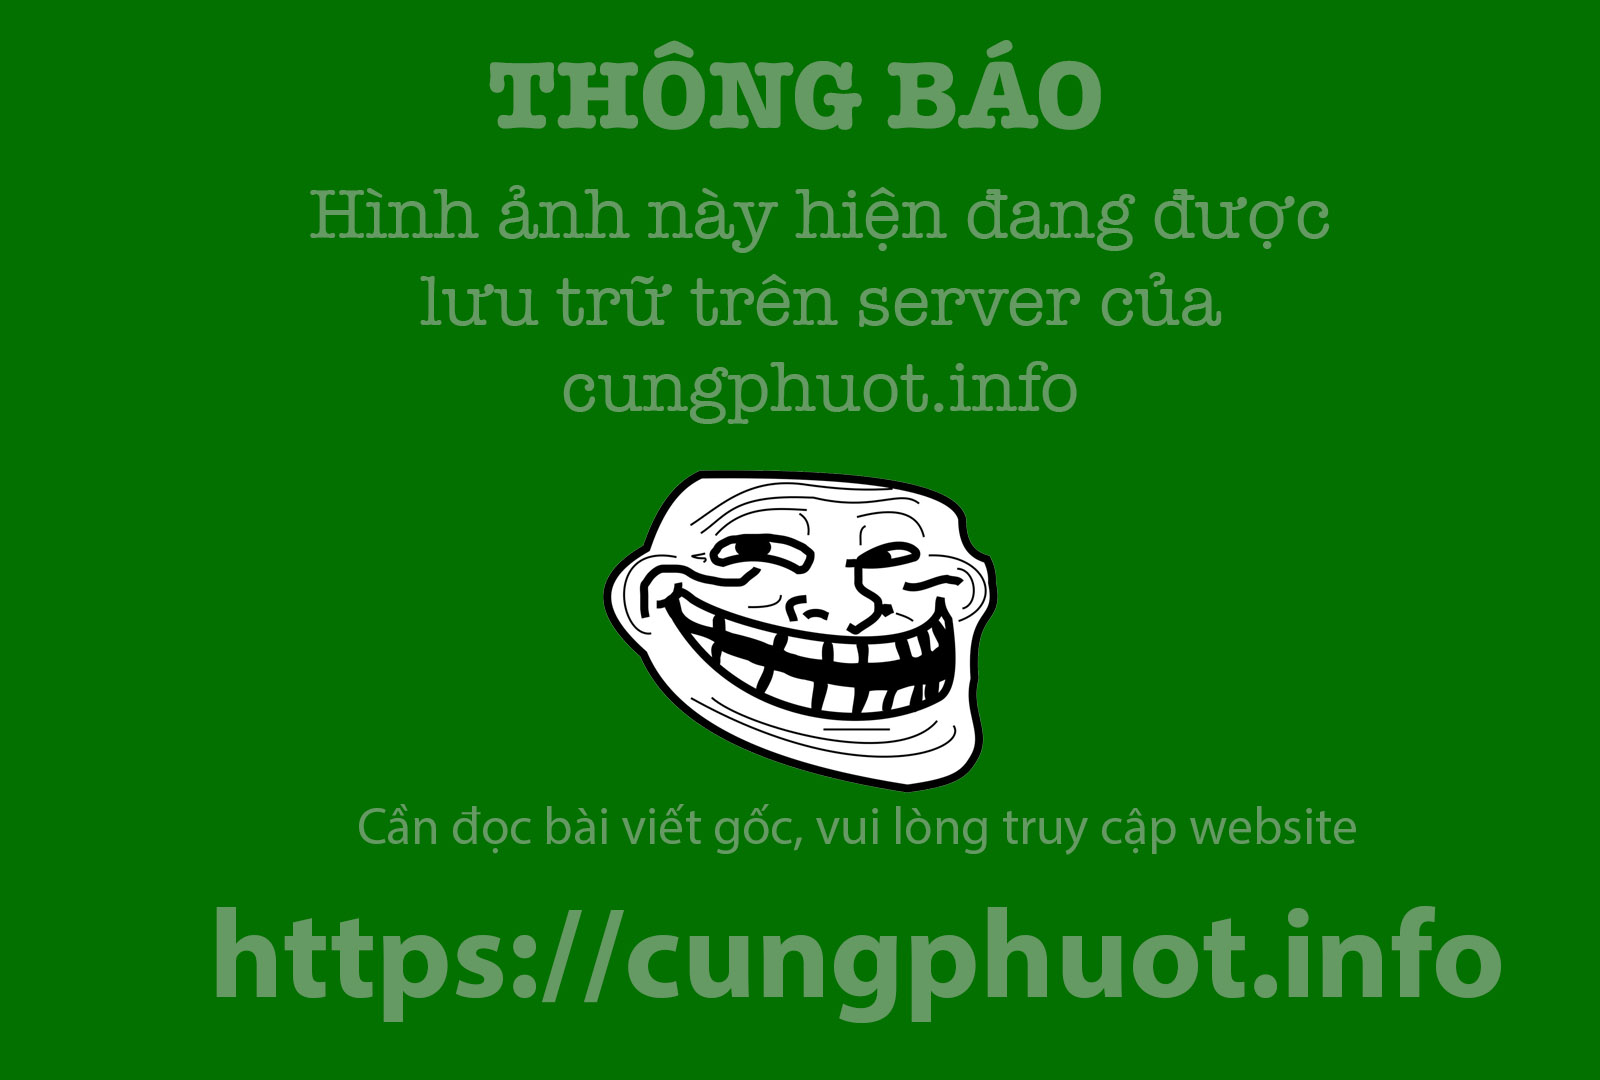 Den Moc Chau san mai anh dao hinh anh 13